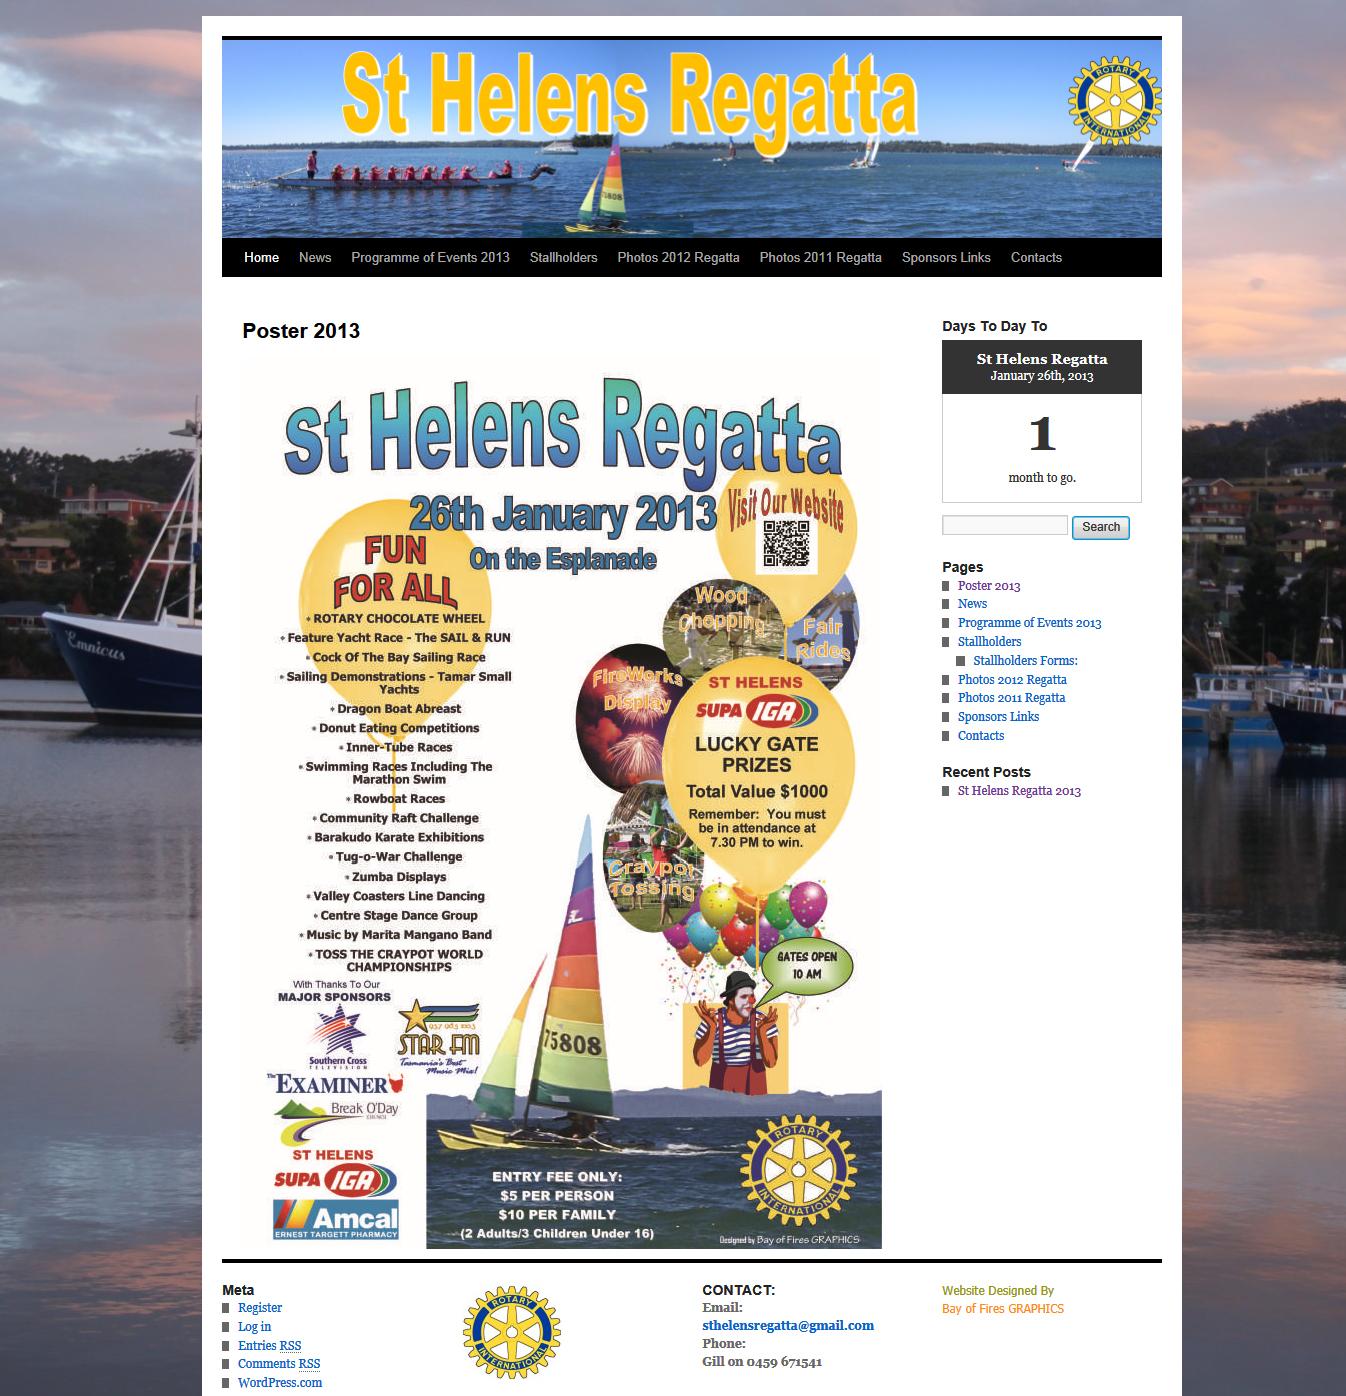 St Helens Regatta